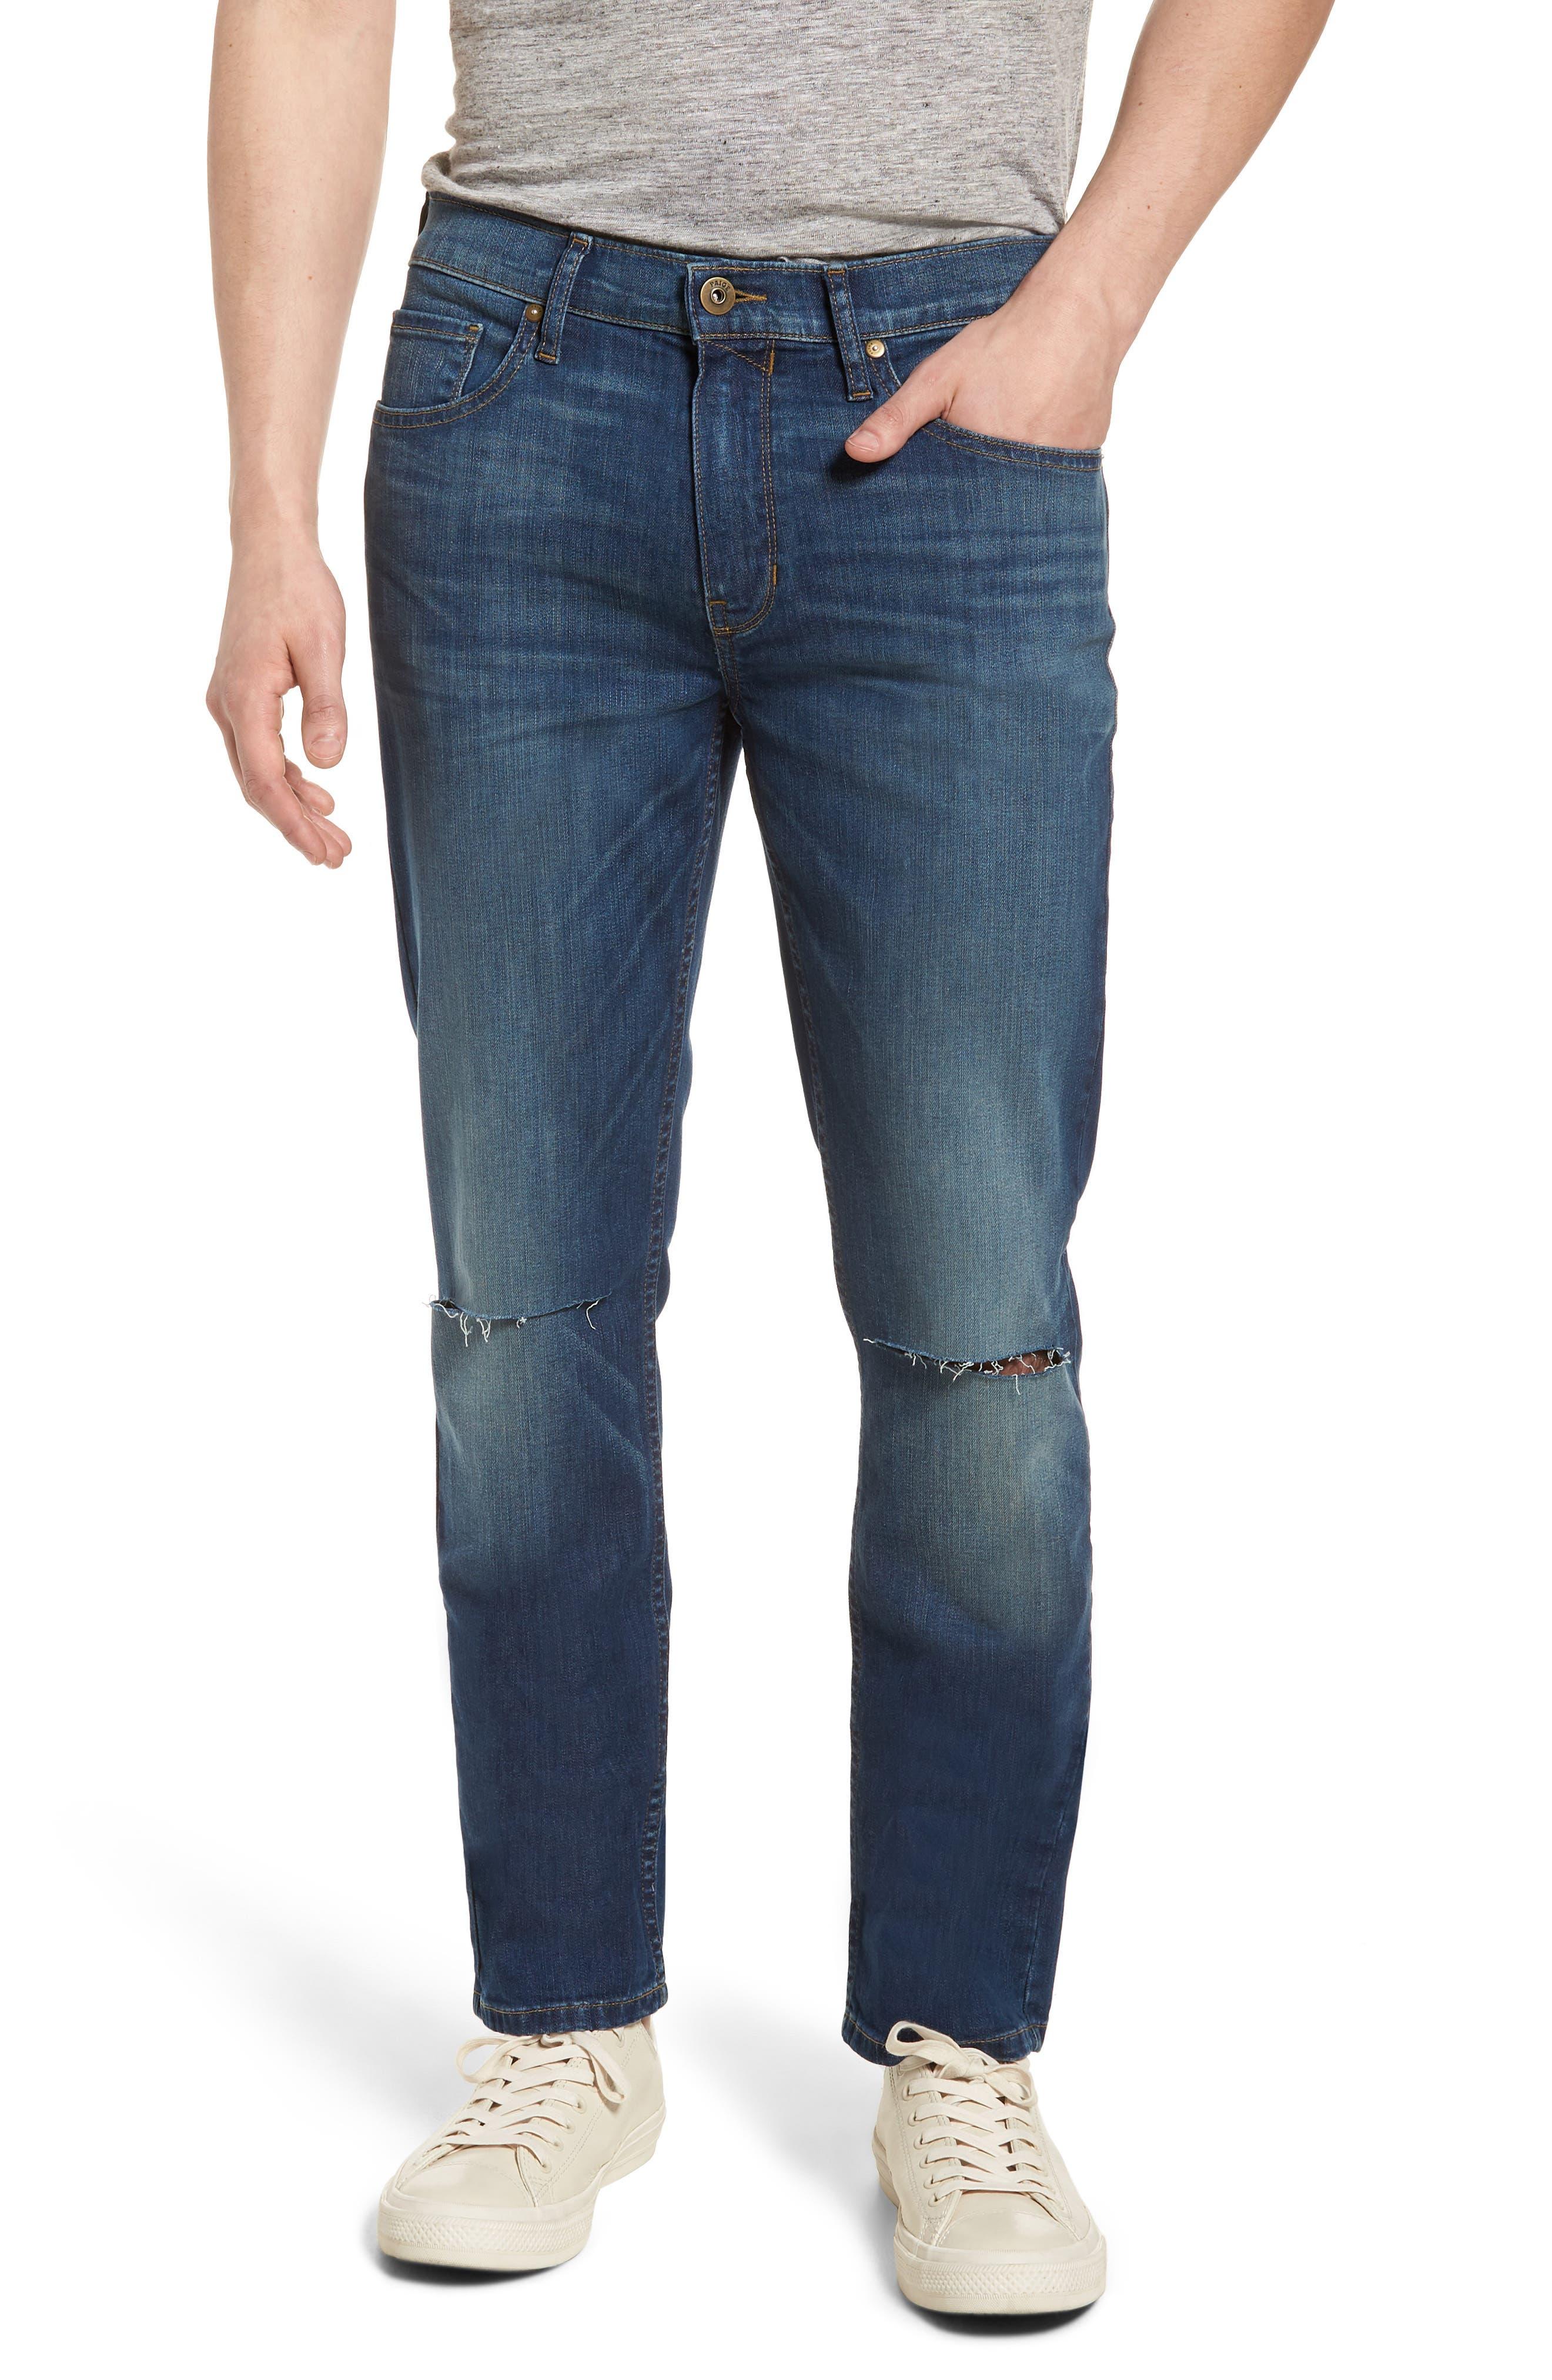 Lennox Slim Fit Jeans,                             Main thumbnail 1, color,                             Harlan Destructed